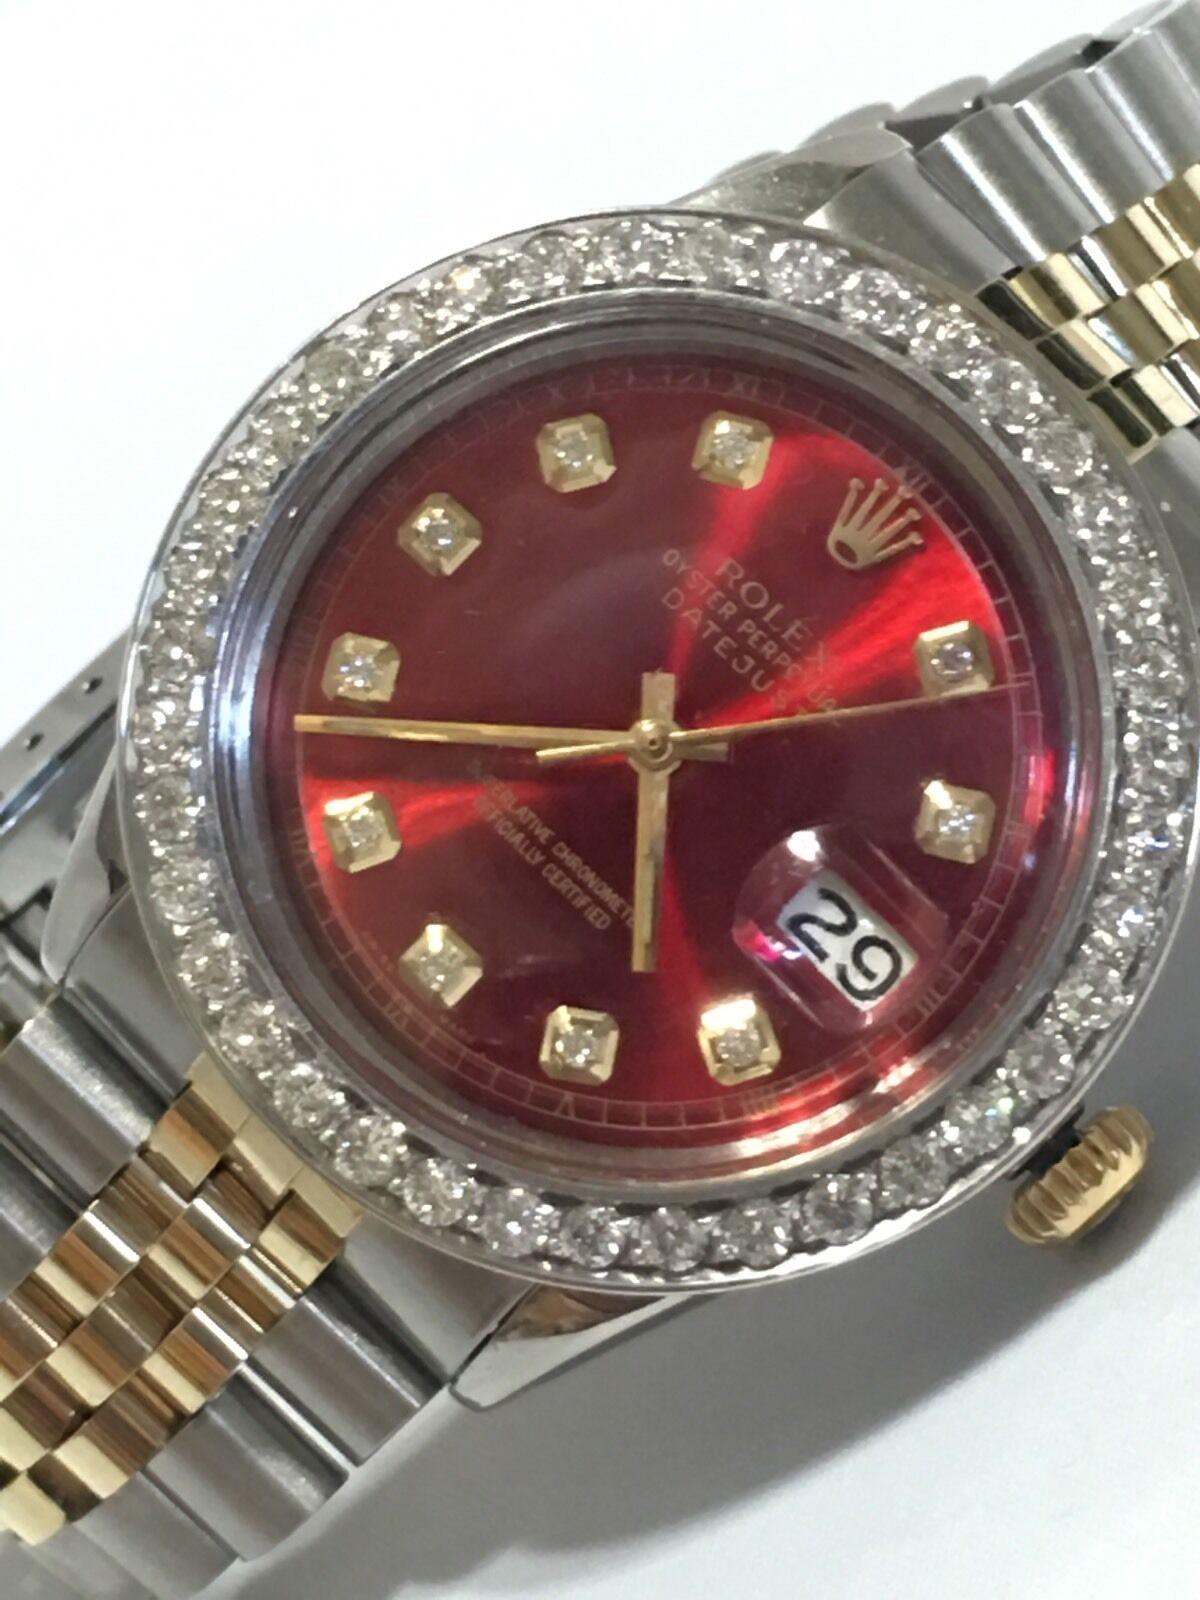 $3995.00 - Rolex mens two tone diamond dial diamond Bezel 36mm Datejust automatic watch